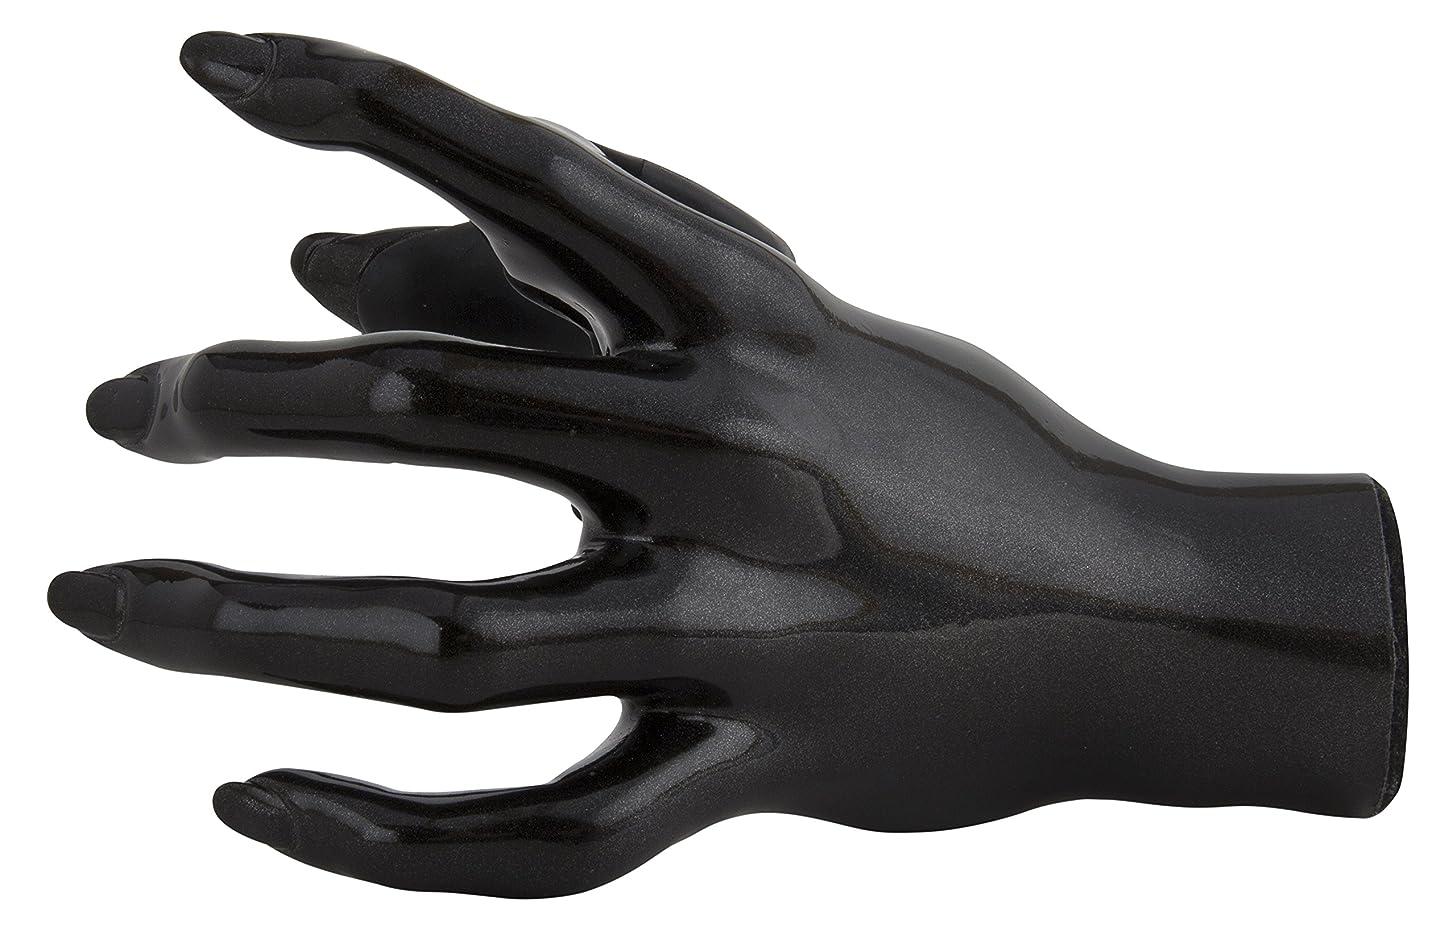 GuitarGrip LHGH-141 Hanger - Female Hand Black Metallic